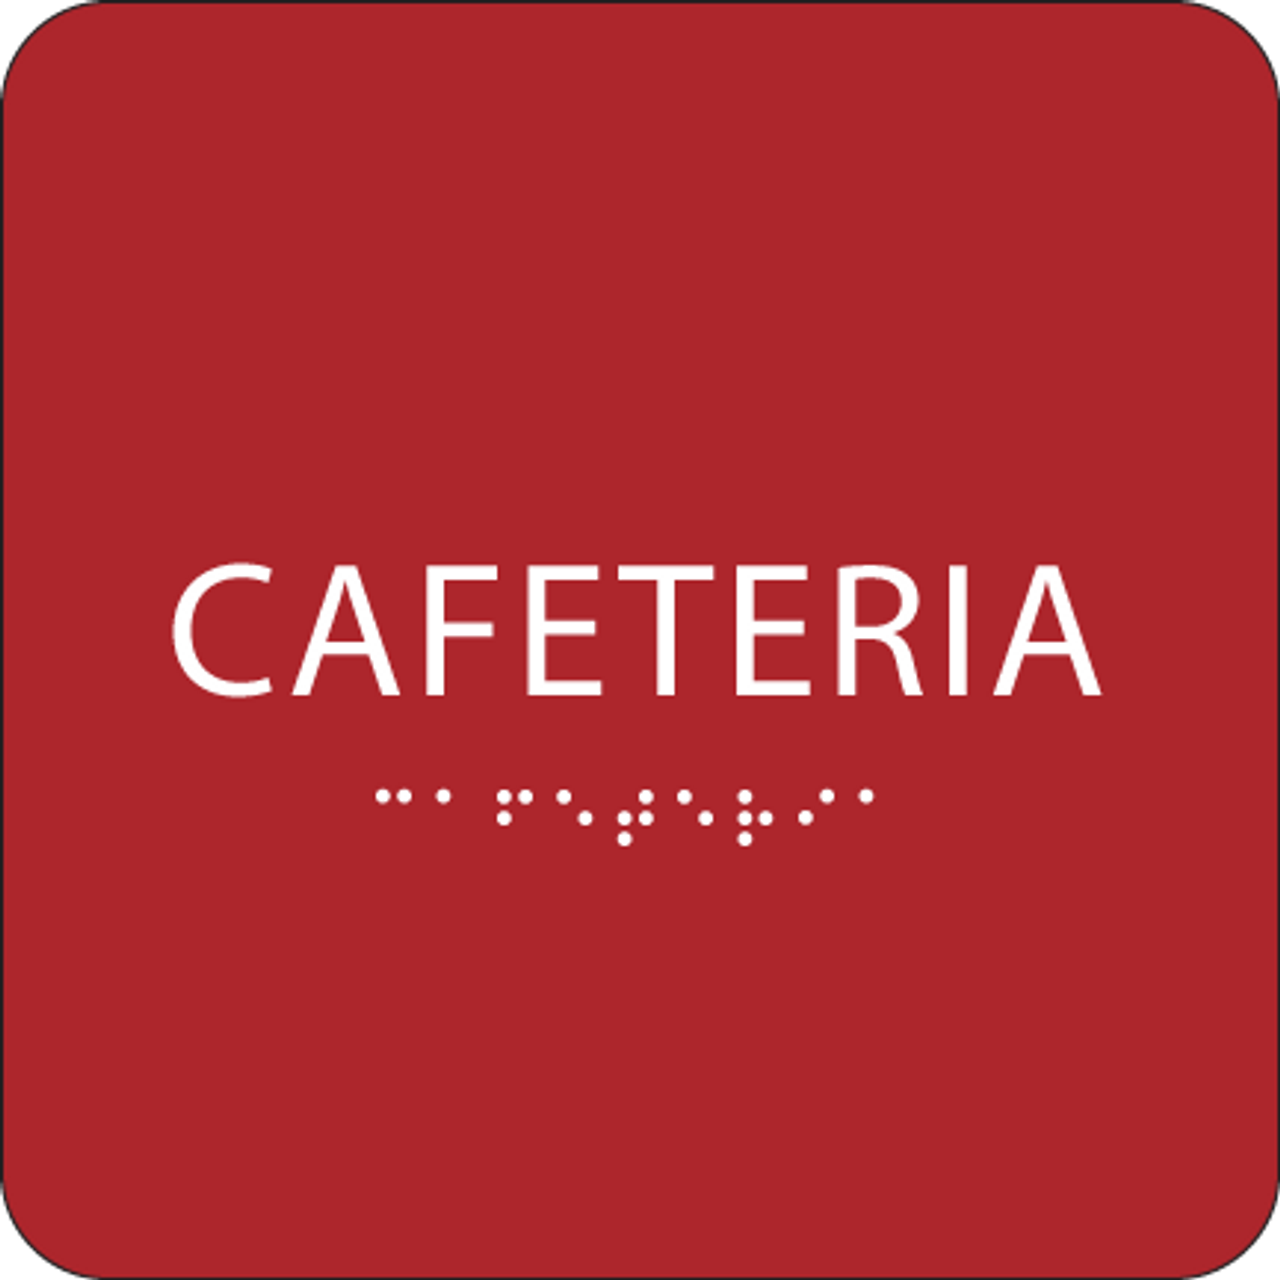 Red Cafeteria ADA Sign